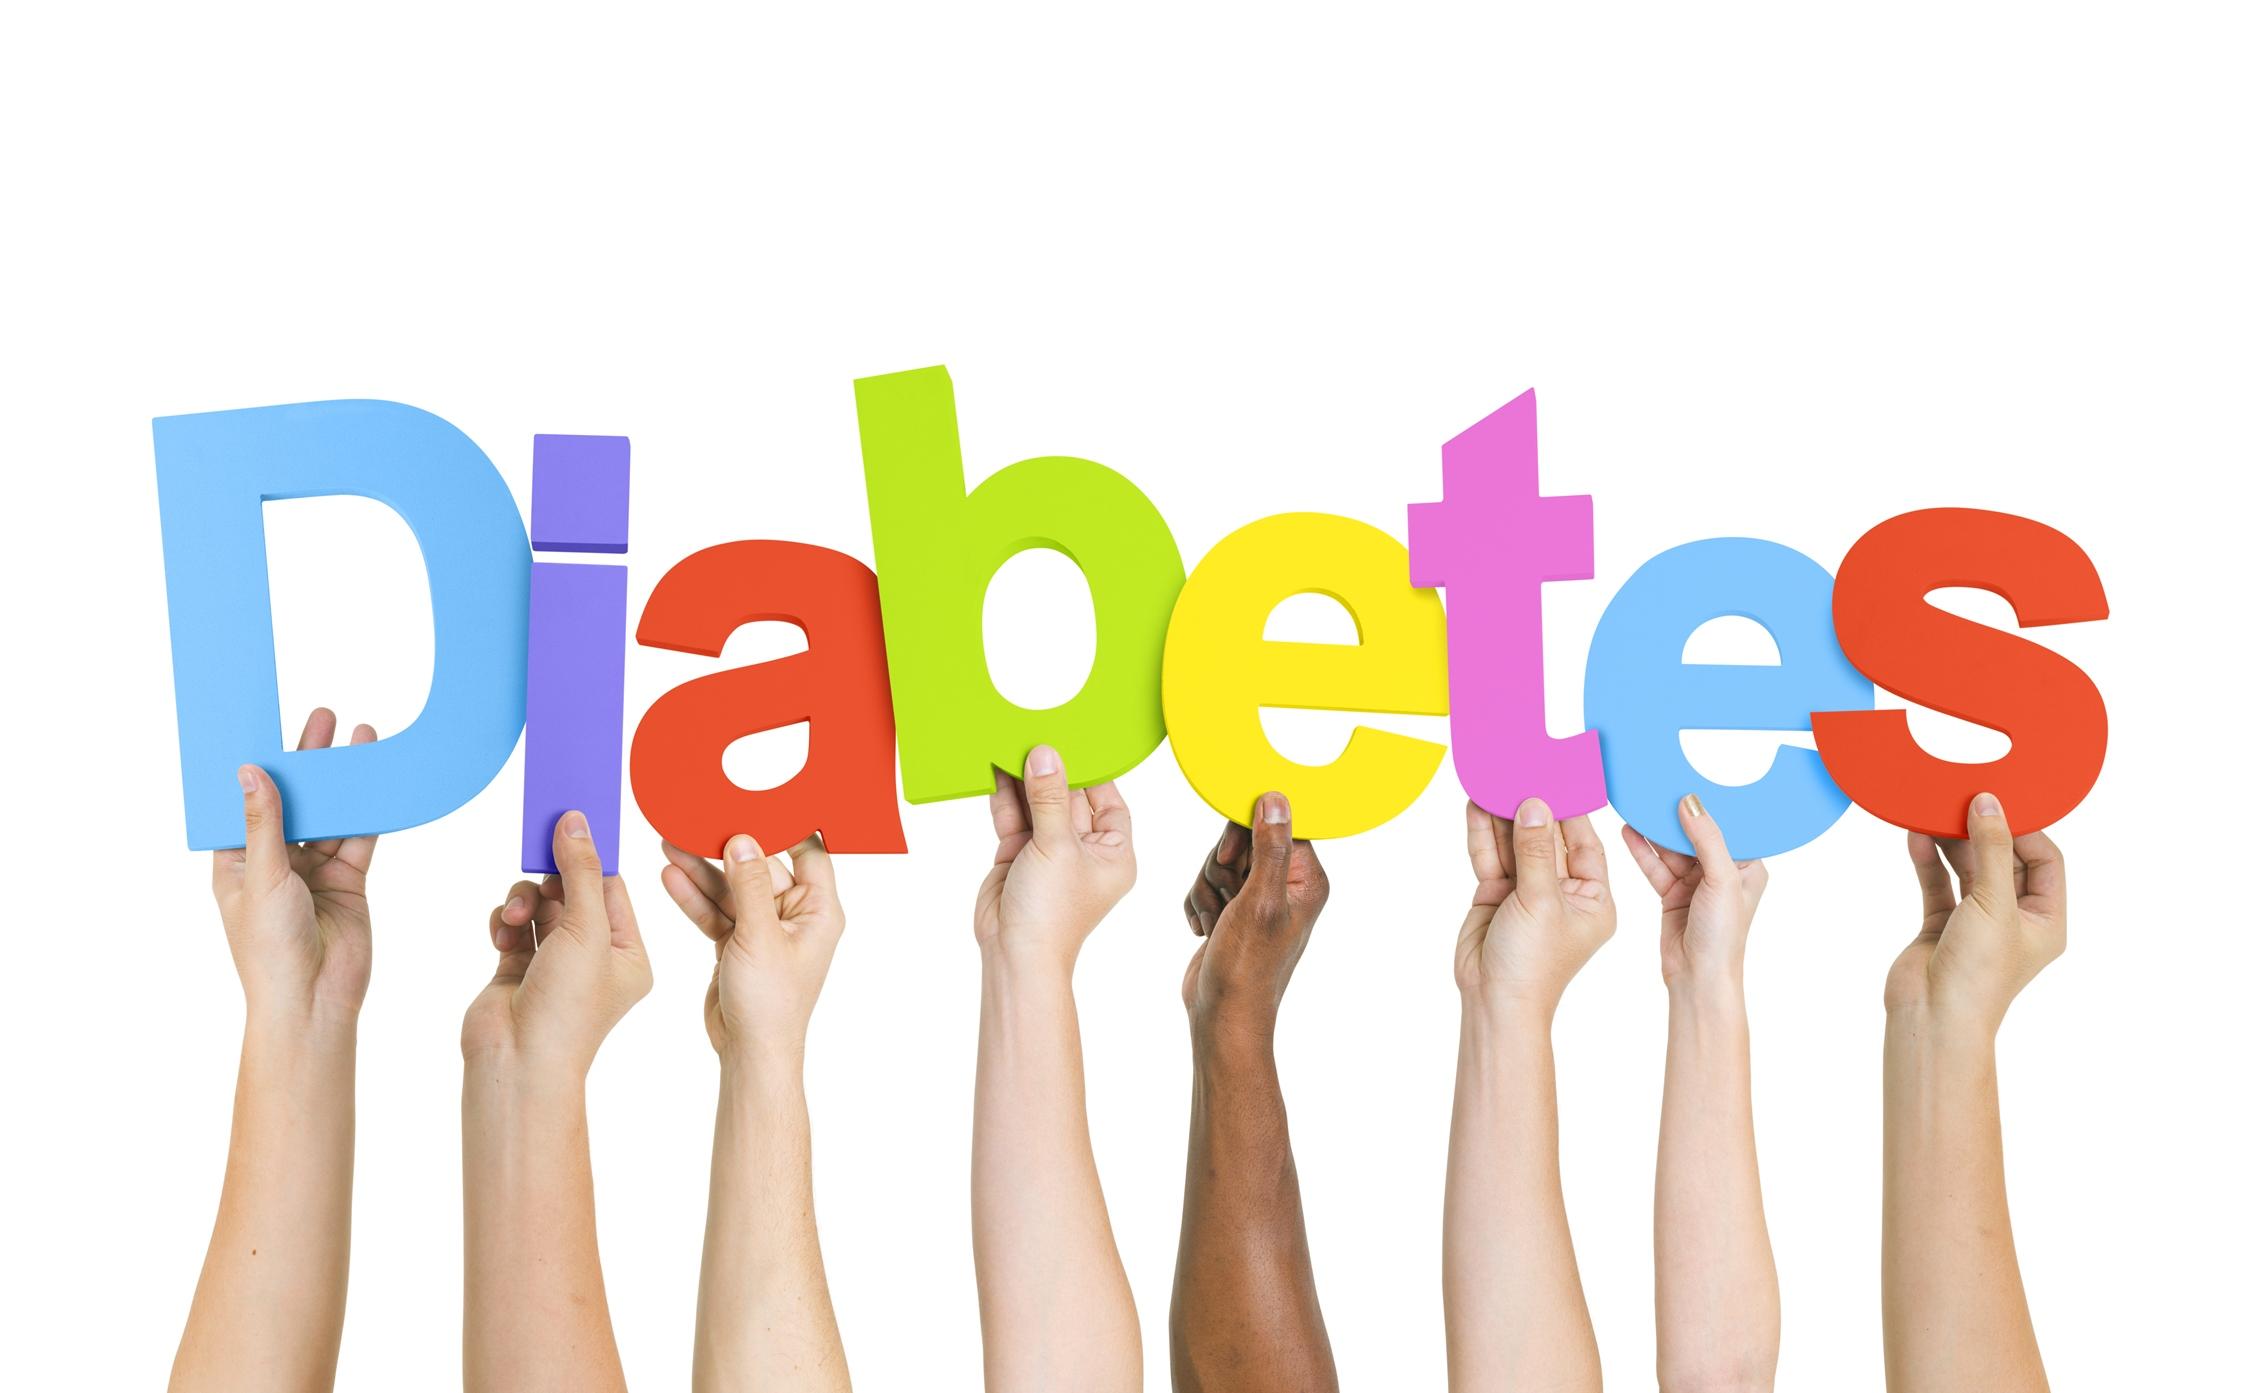 Congresso apresenta técnica que pode revascularizar membros de diabéticos